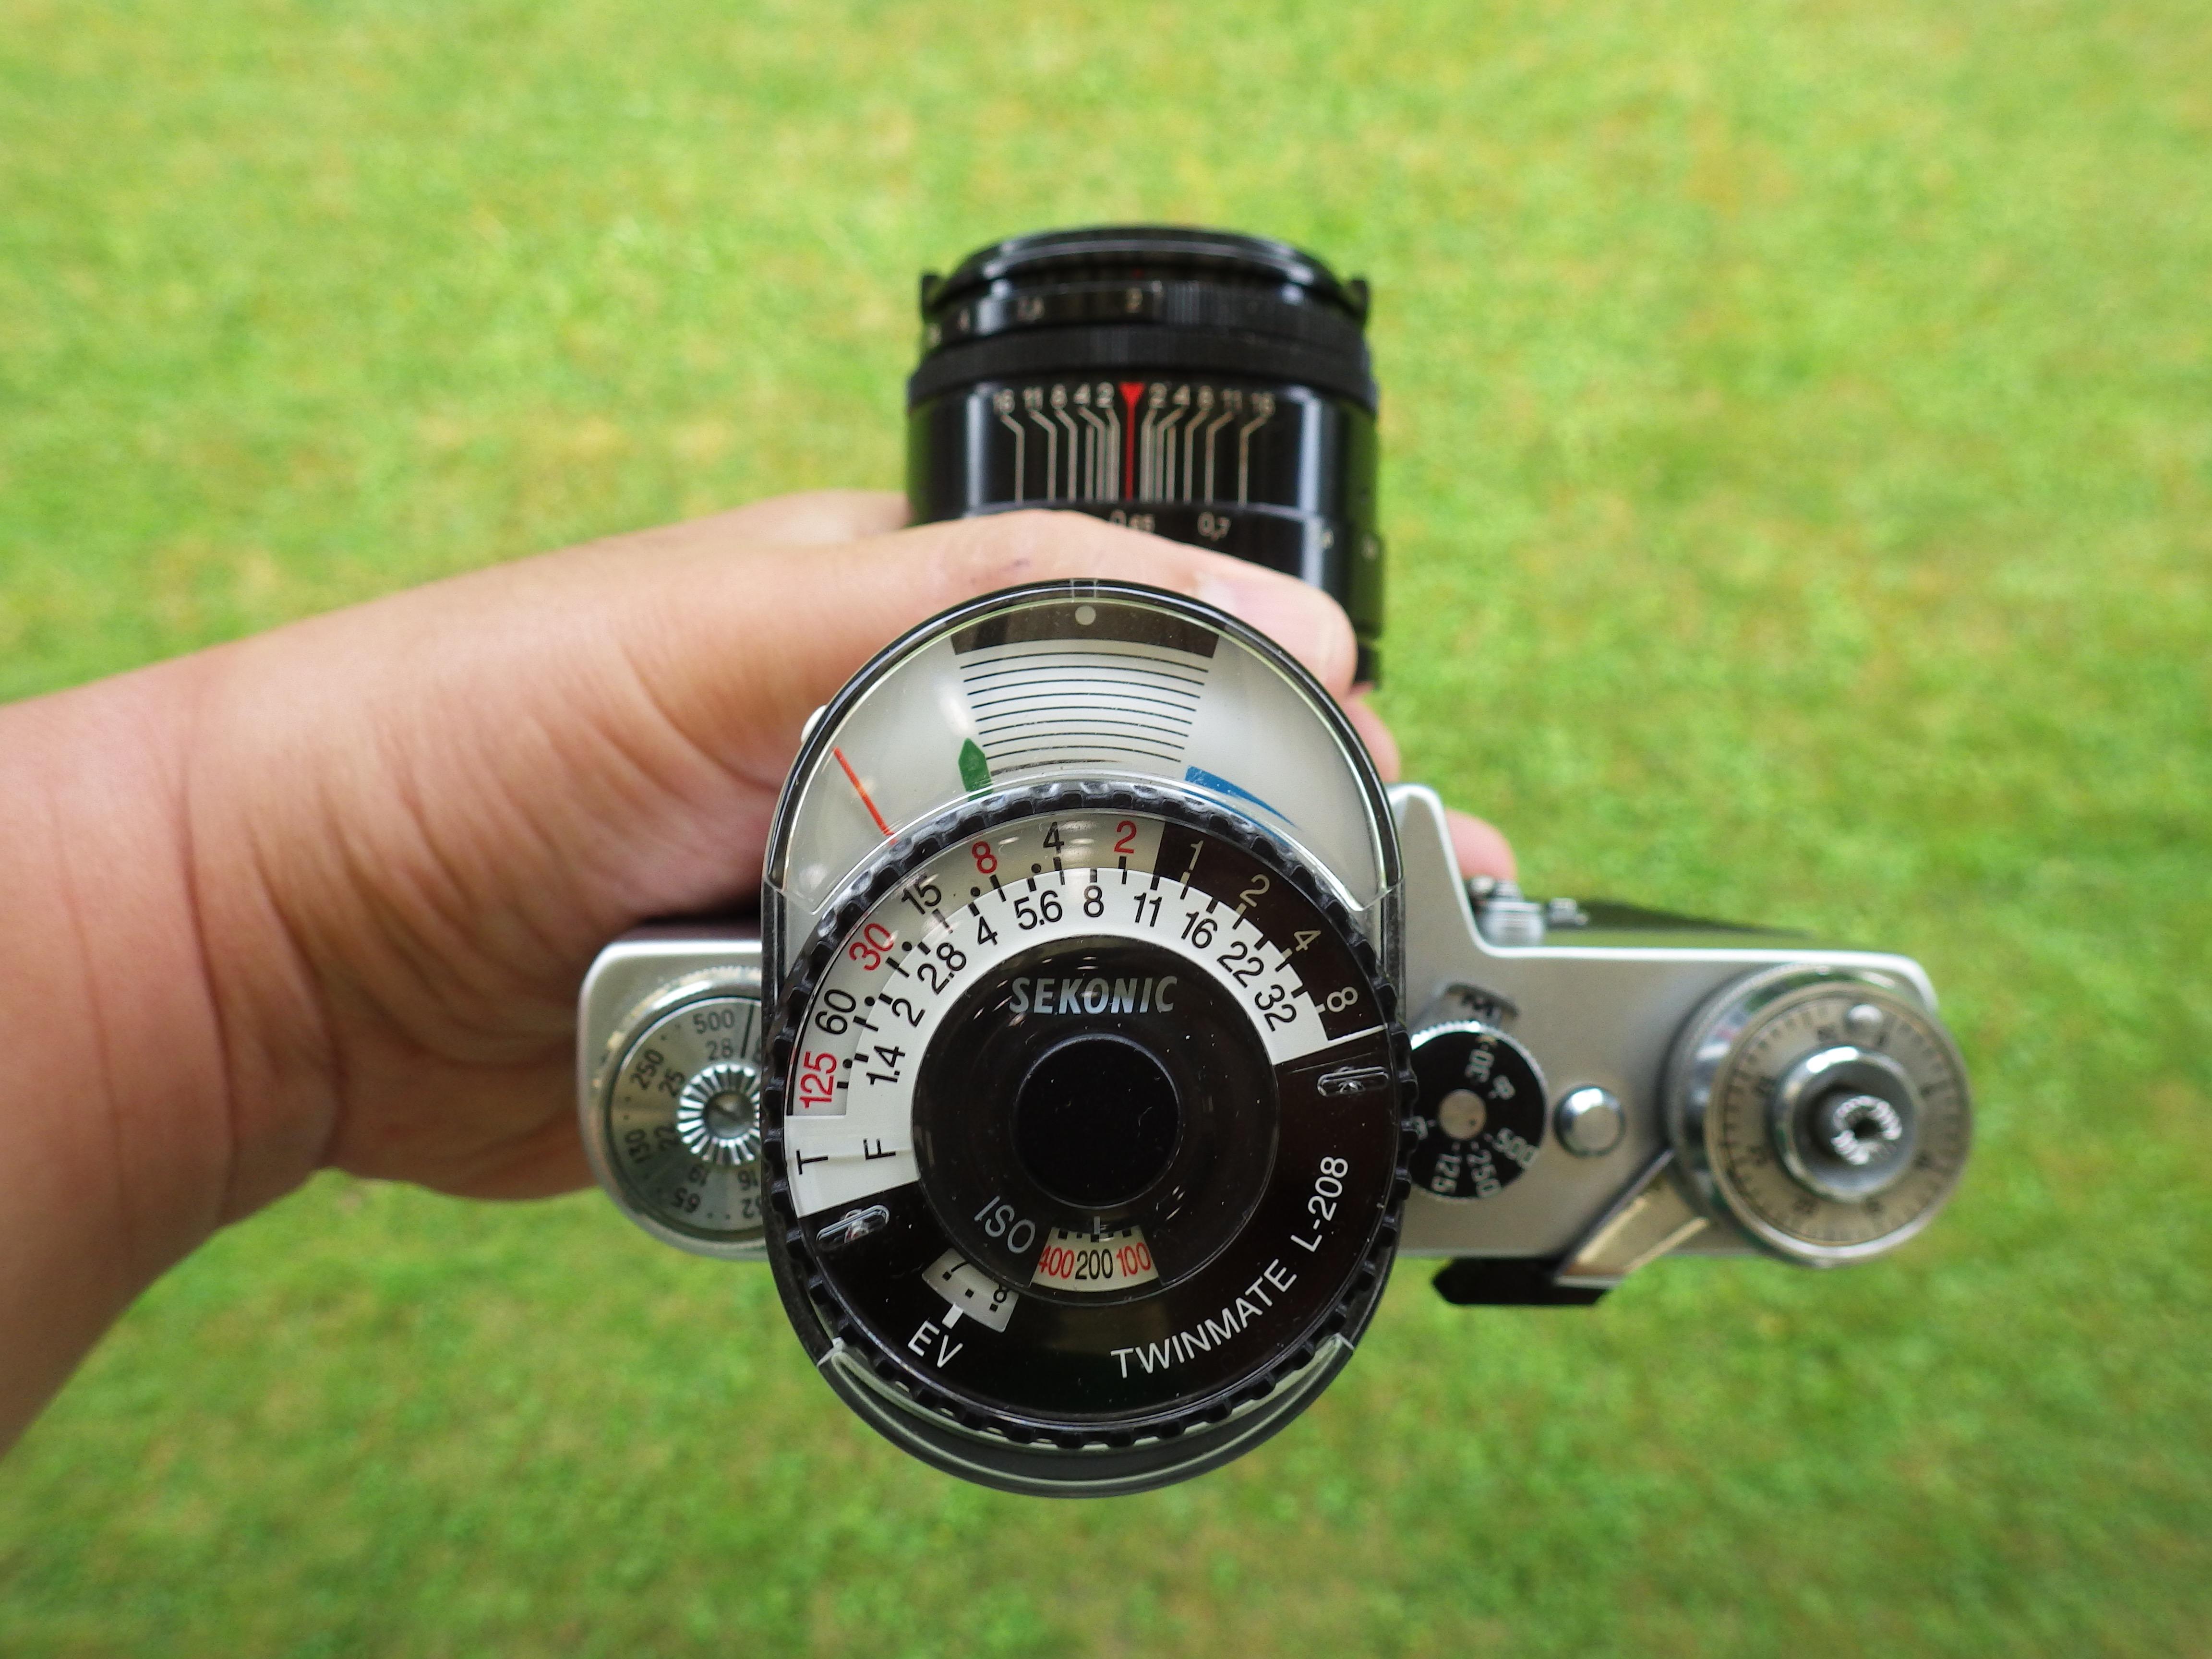 Free Images : wheel, tool, meter, product, filmcamera